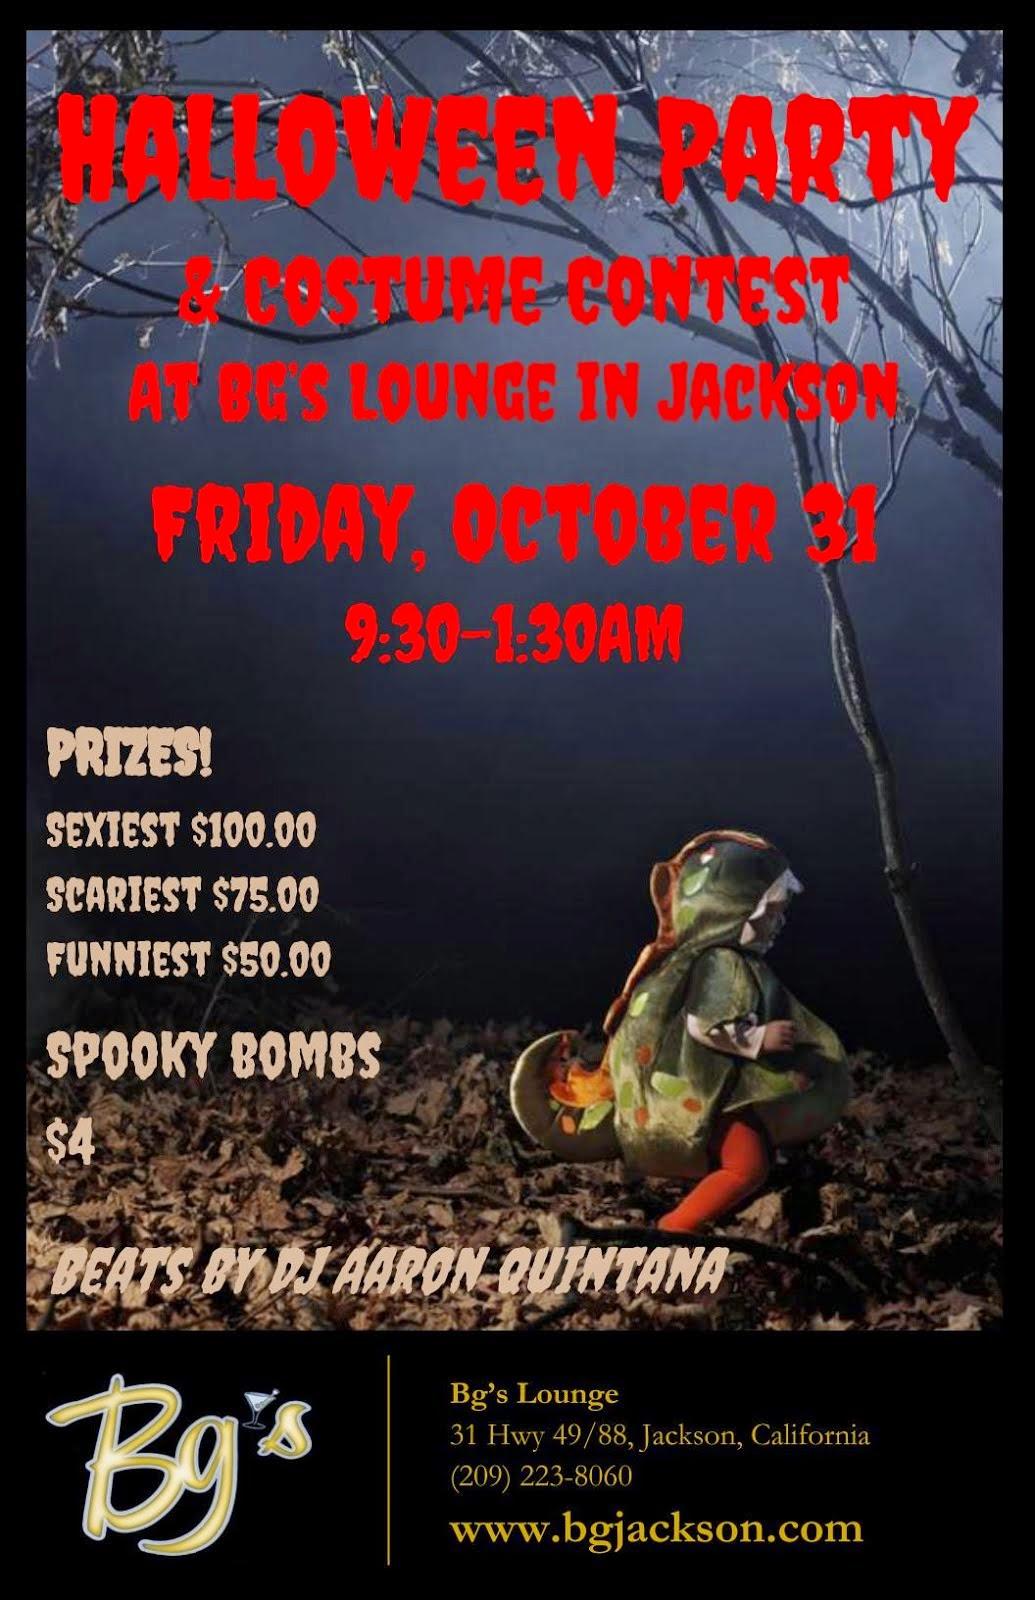 Bg's Halloween Party & Costume Contest - Oct 31